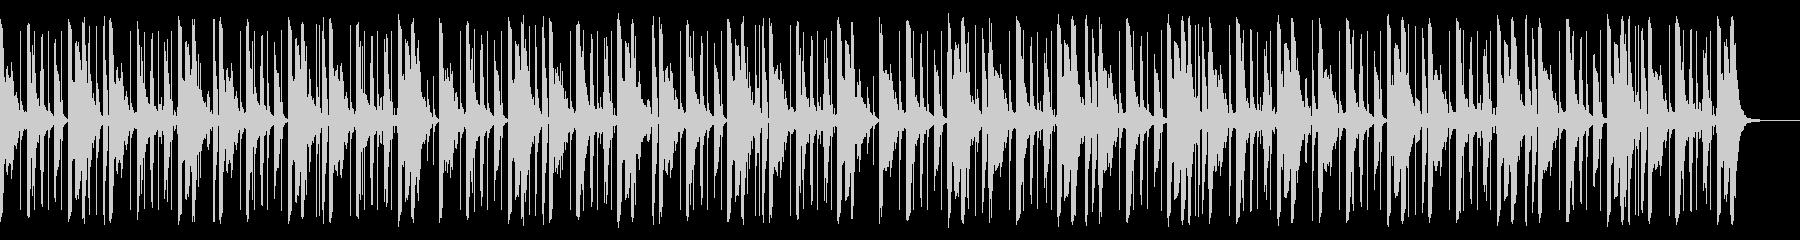 118 BPMの未再生の波形